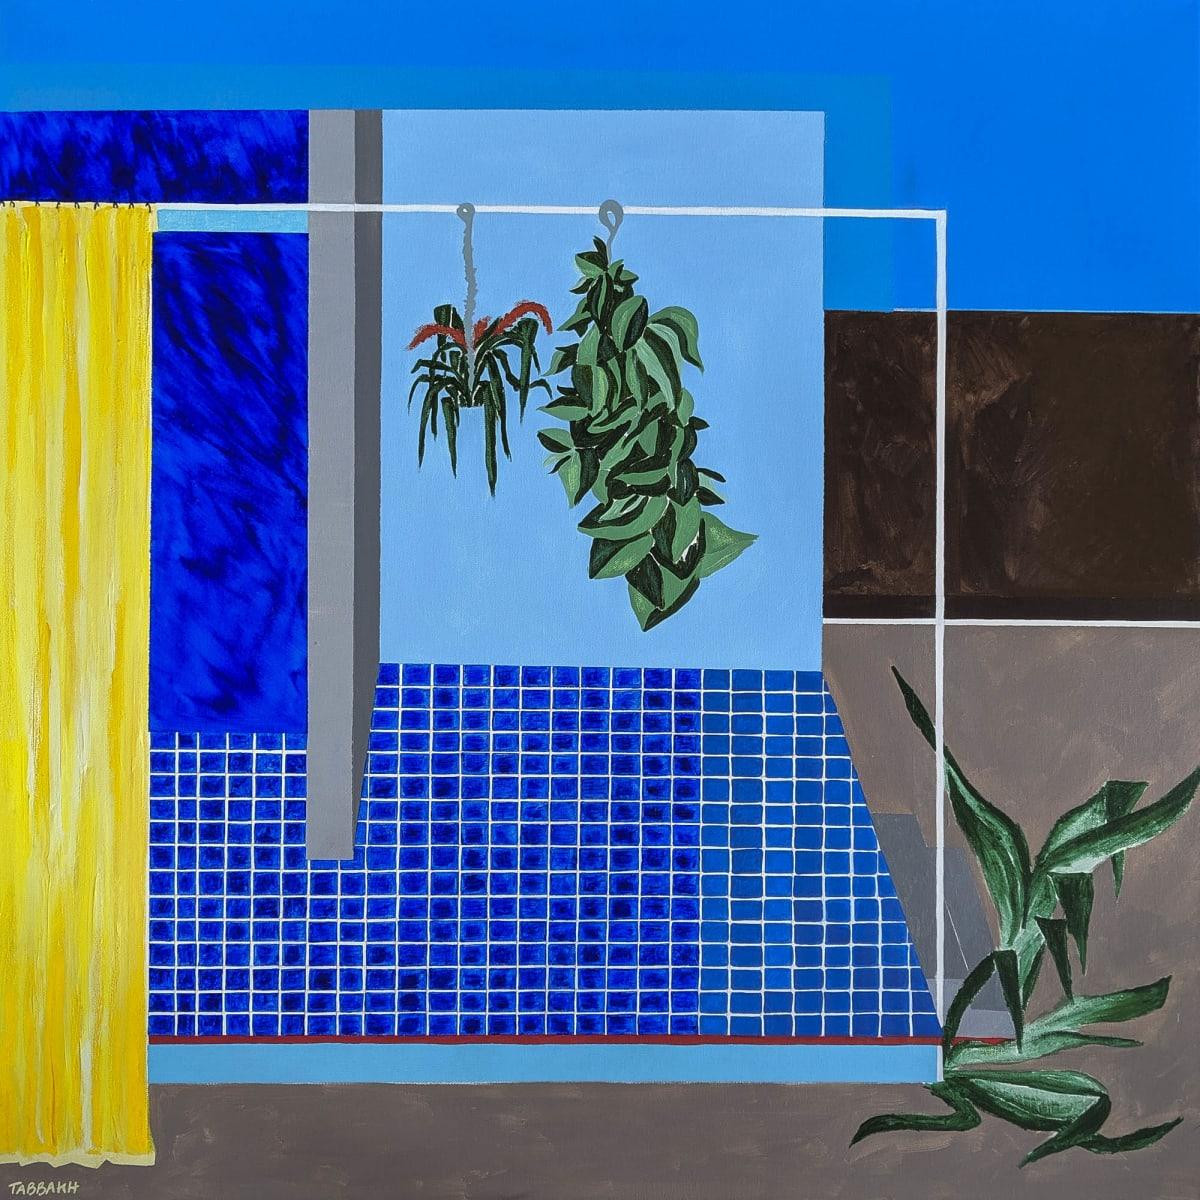 Cathy Tabbakh, Modern Housing , 2019